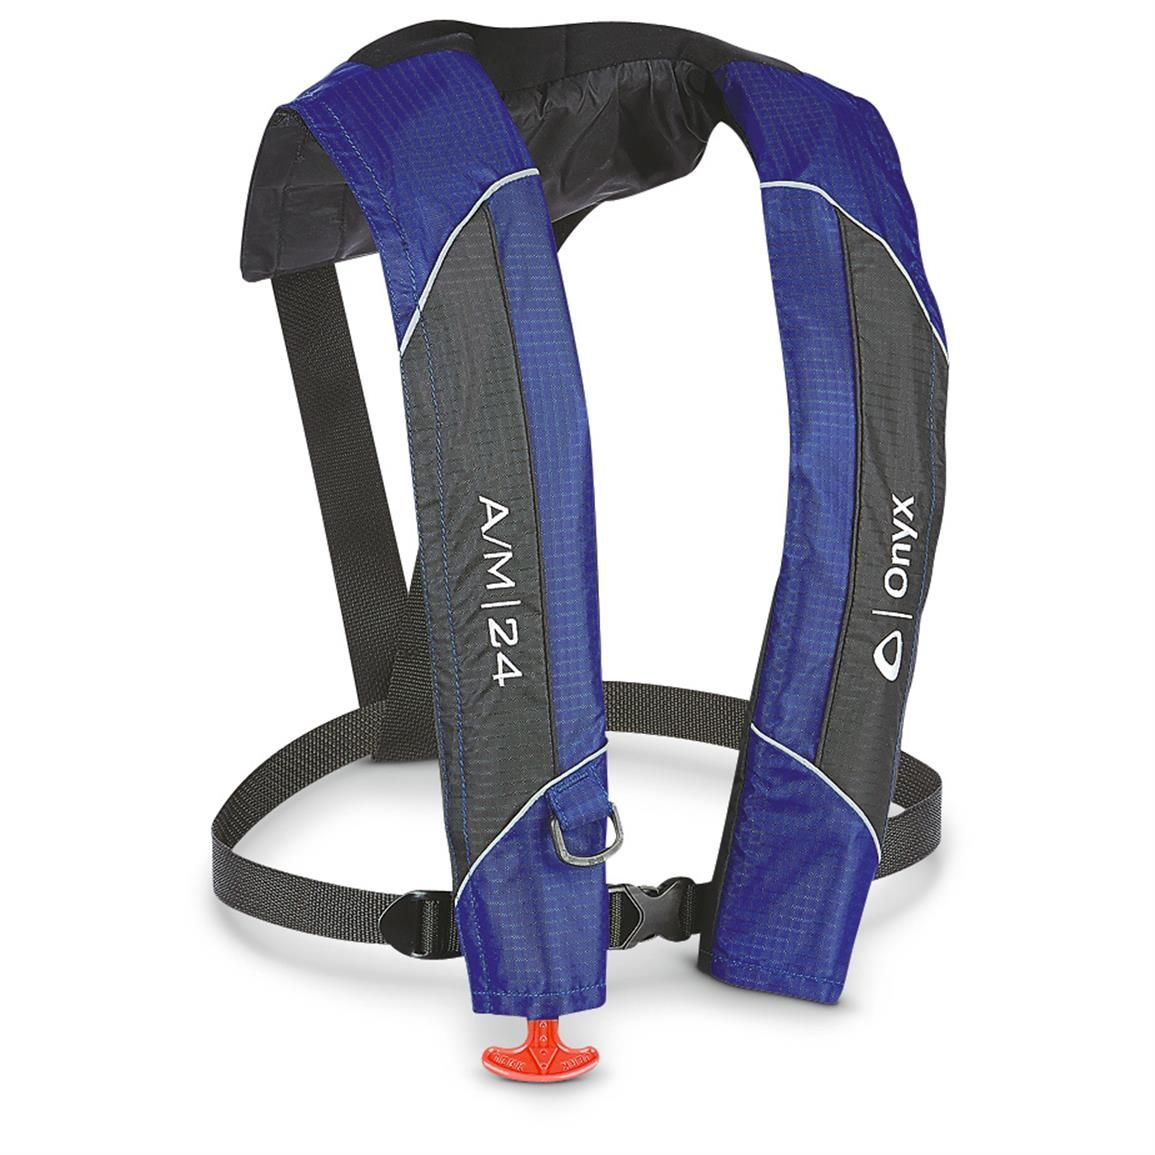 Onyx M24 Automatic / Manual Inflatable Life Jacket (PFD